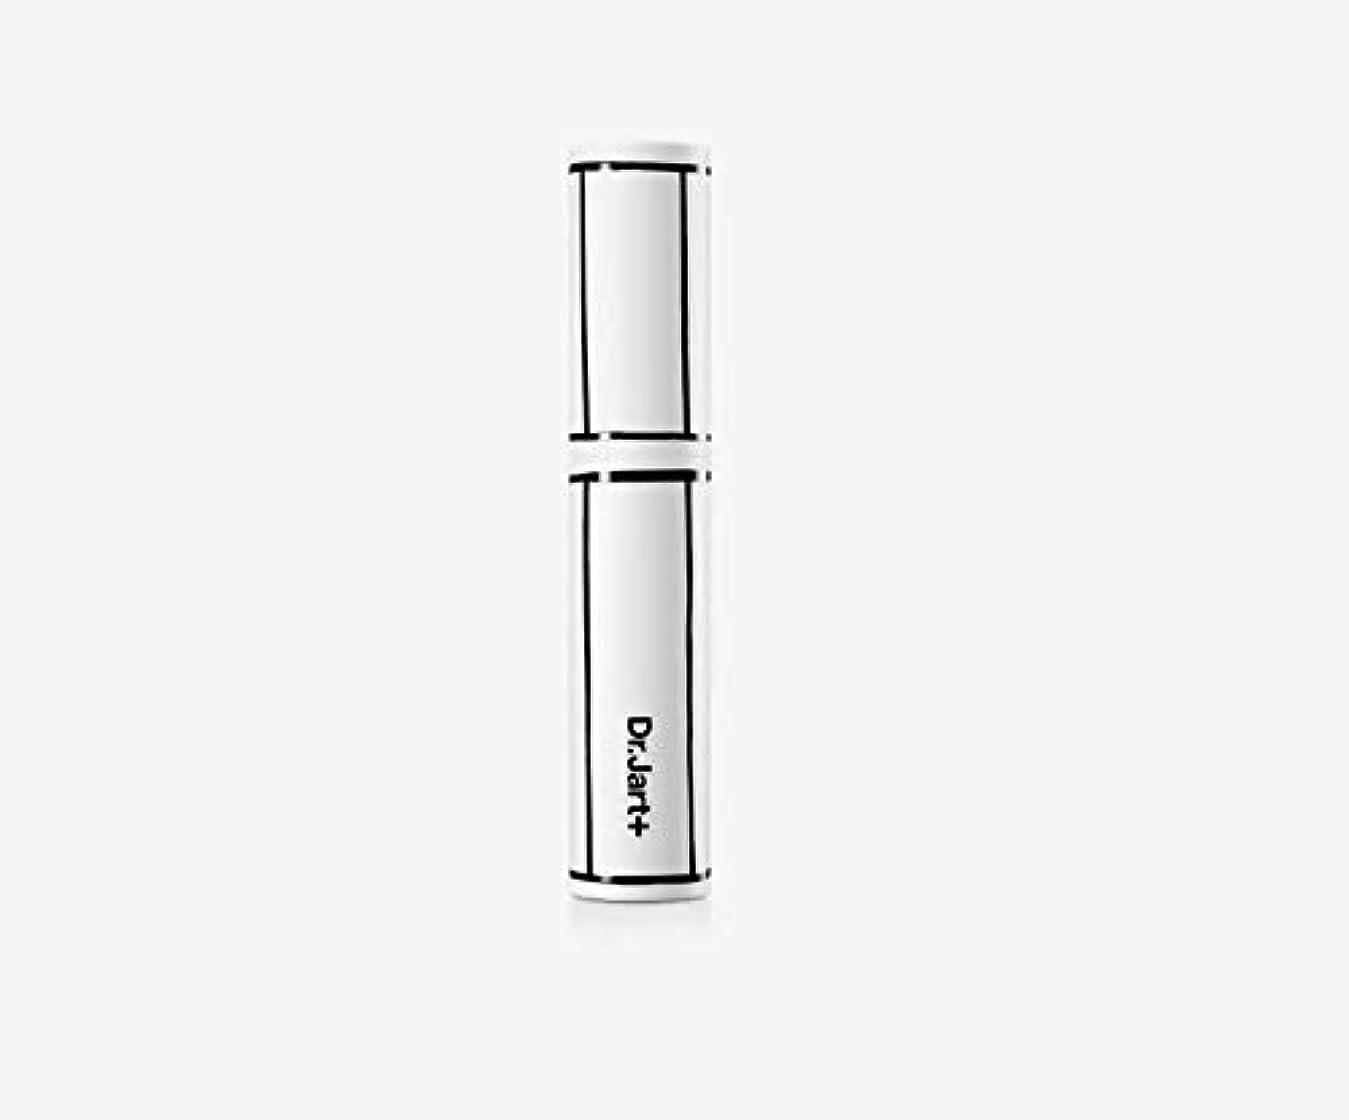 Dr.Jart+ドクタージャルトゥザメーキャップソフトリキッドコンシーラー SPF30 PA++ 5ml / Dr.Jart+ Dermakeup Soft Liquid Concealer SPF30 PA++ 5ml...